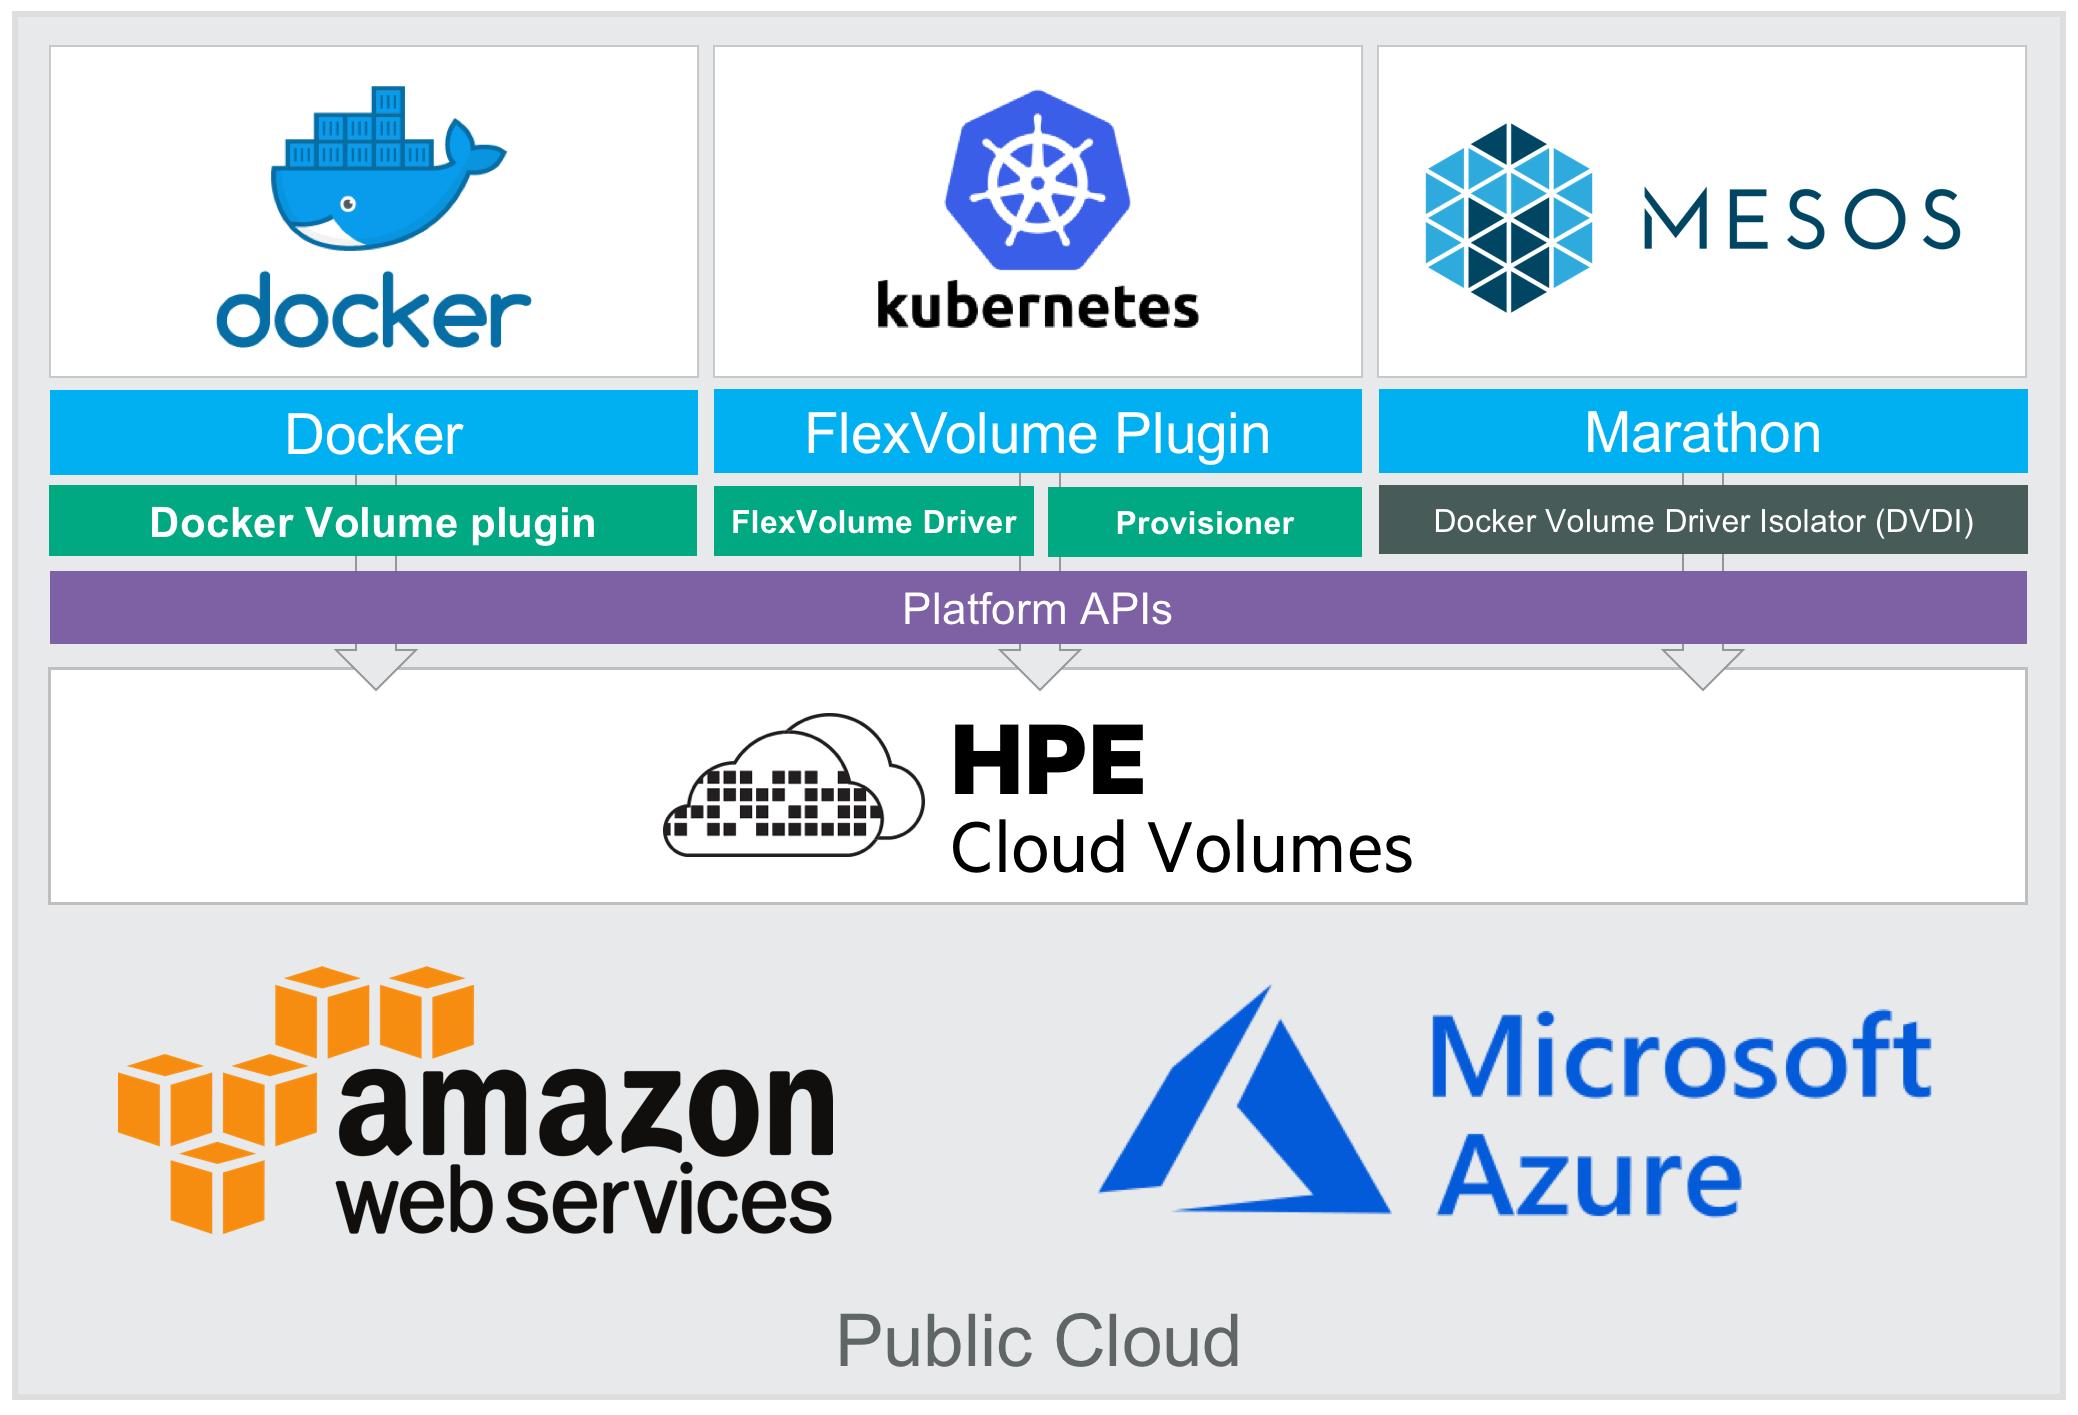 hpecv-stackdiagram-logos.png